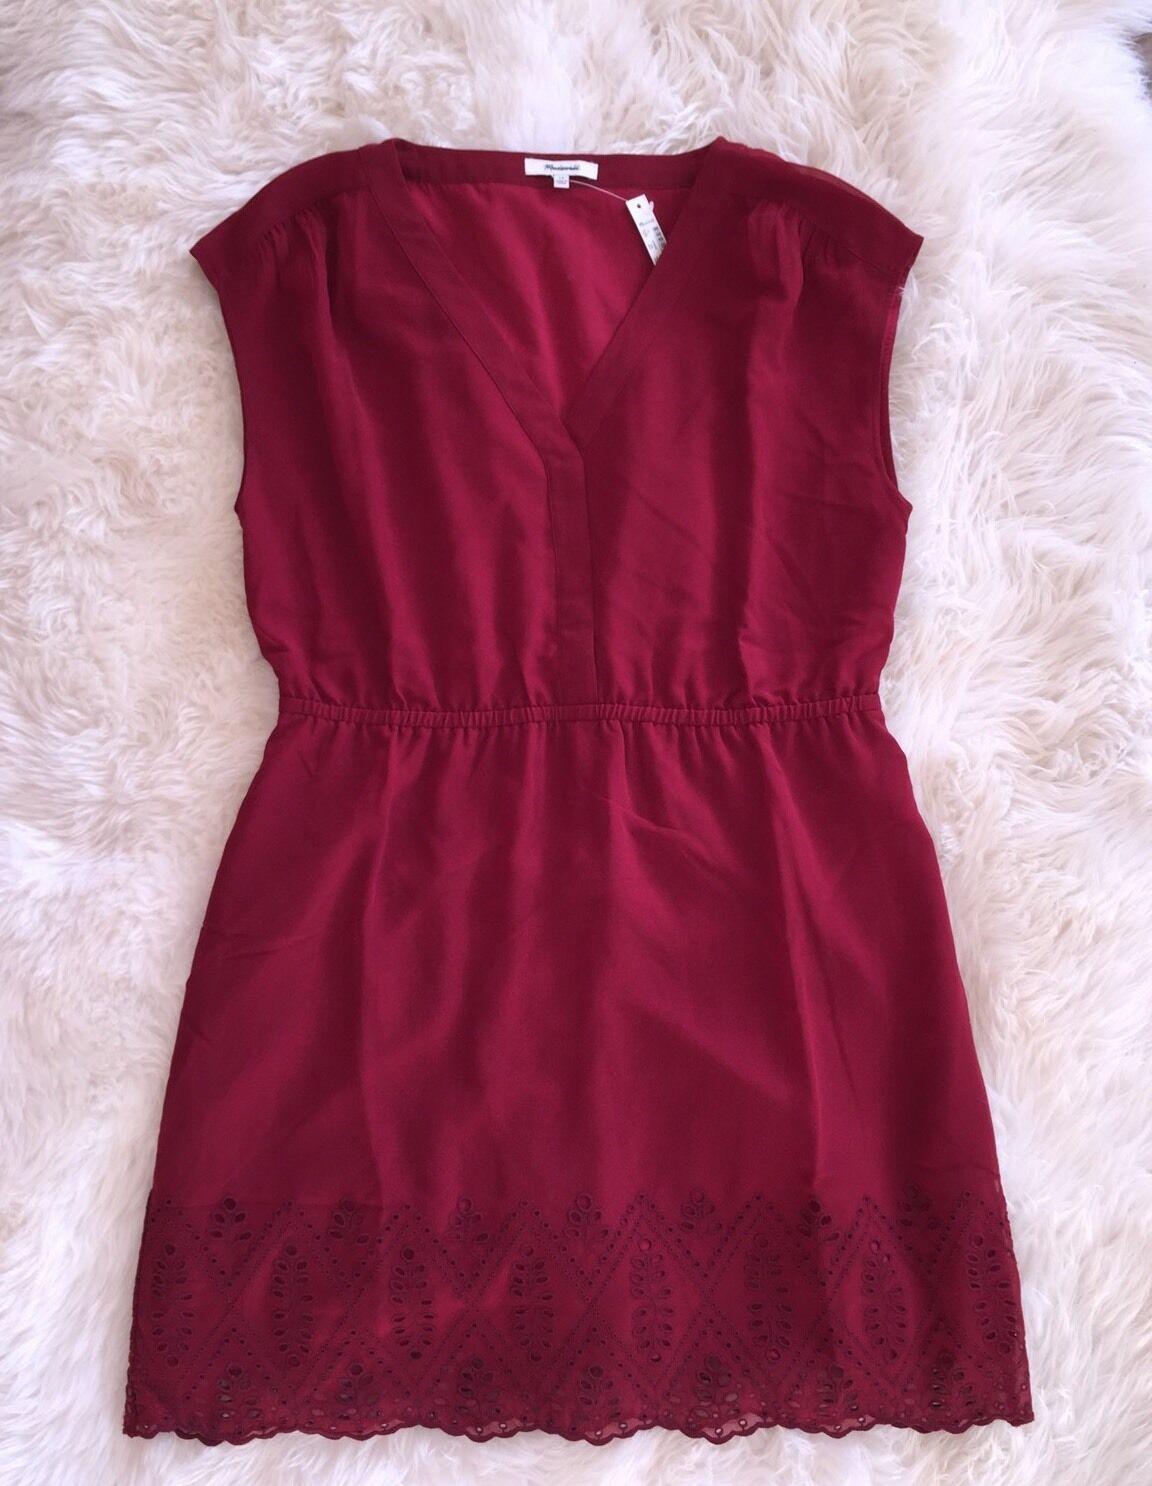 New Madewell    148 Skygaze Eyelet Dress Sz 14 Bright Garnet Red F6076 ec5a31